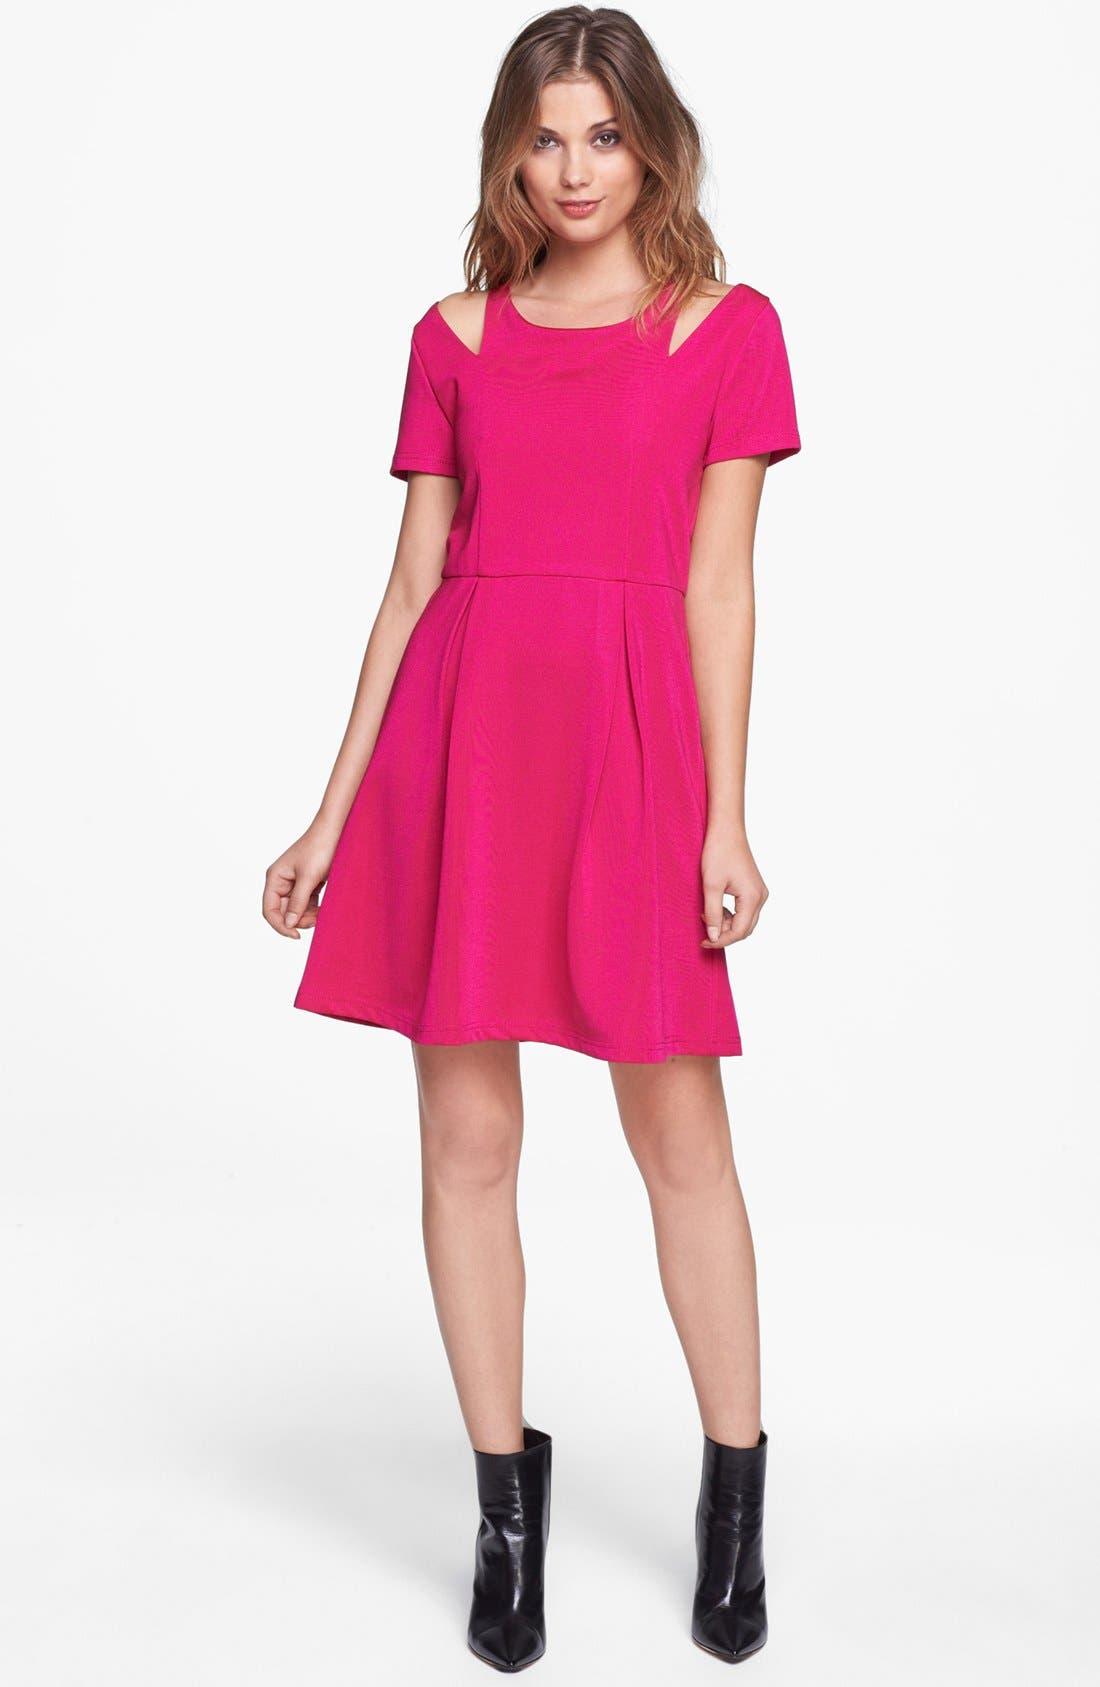 Main Image - MINKPINK Shoulder Cutout Fit & Flare Dress